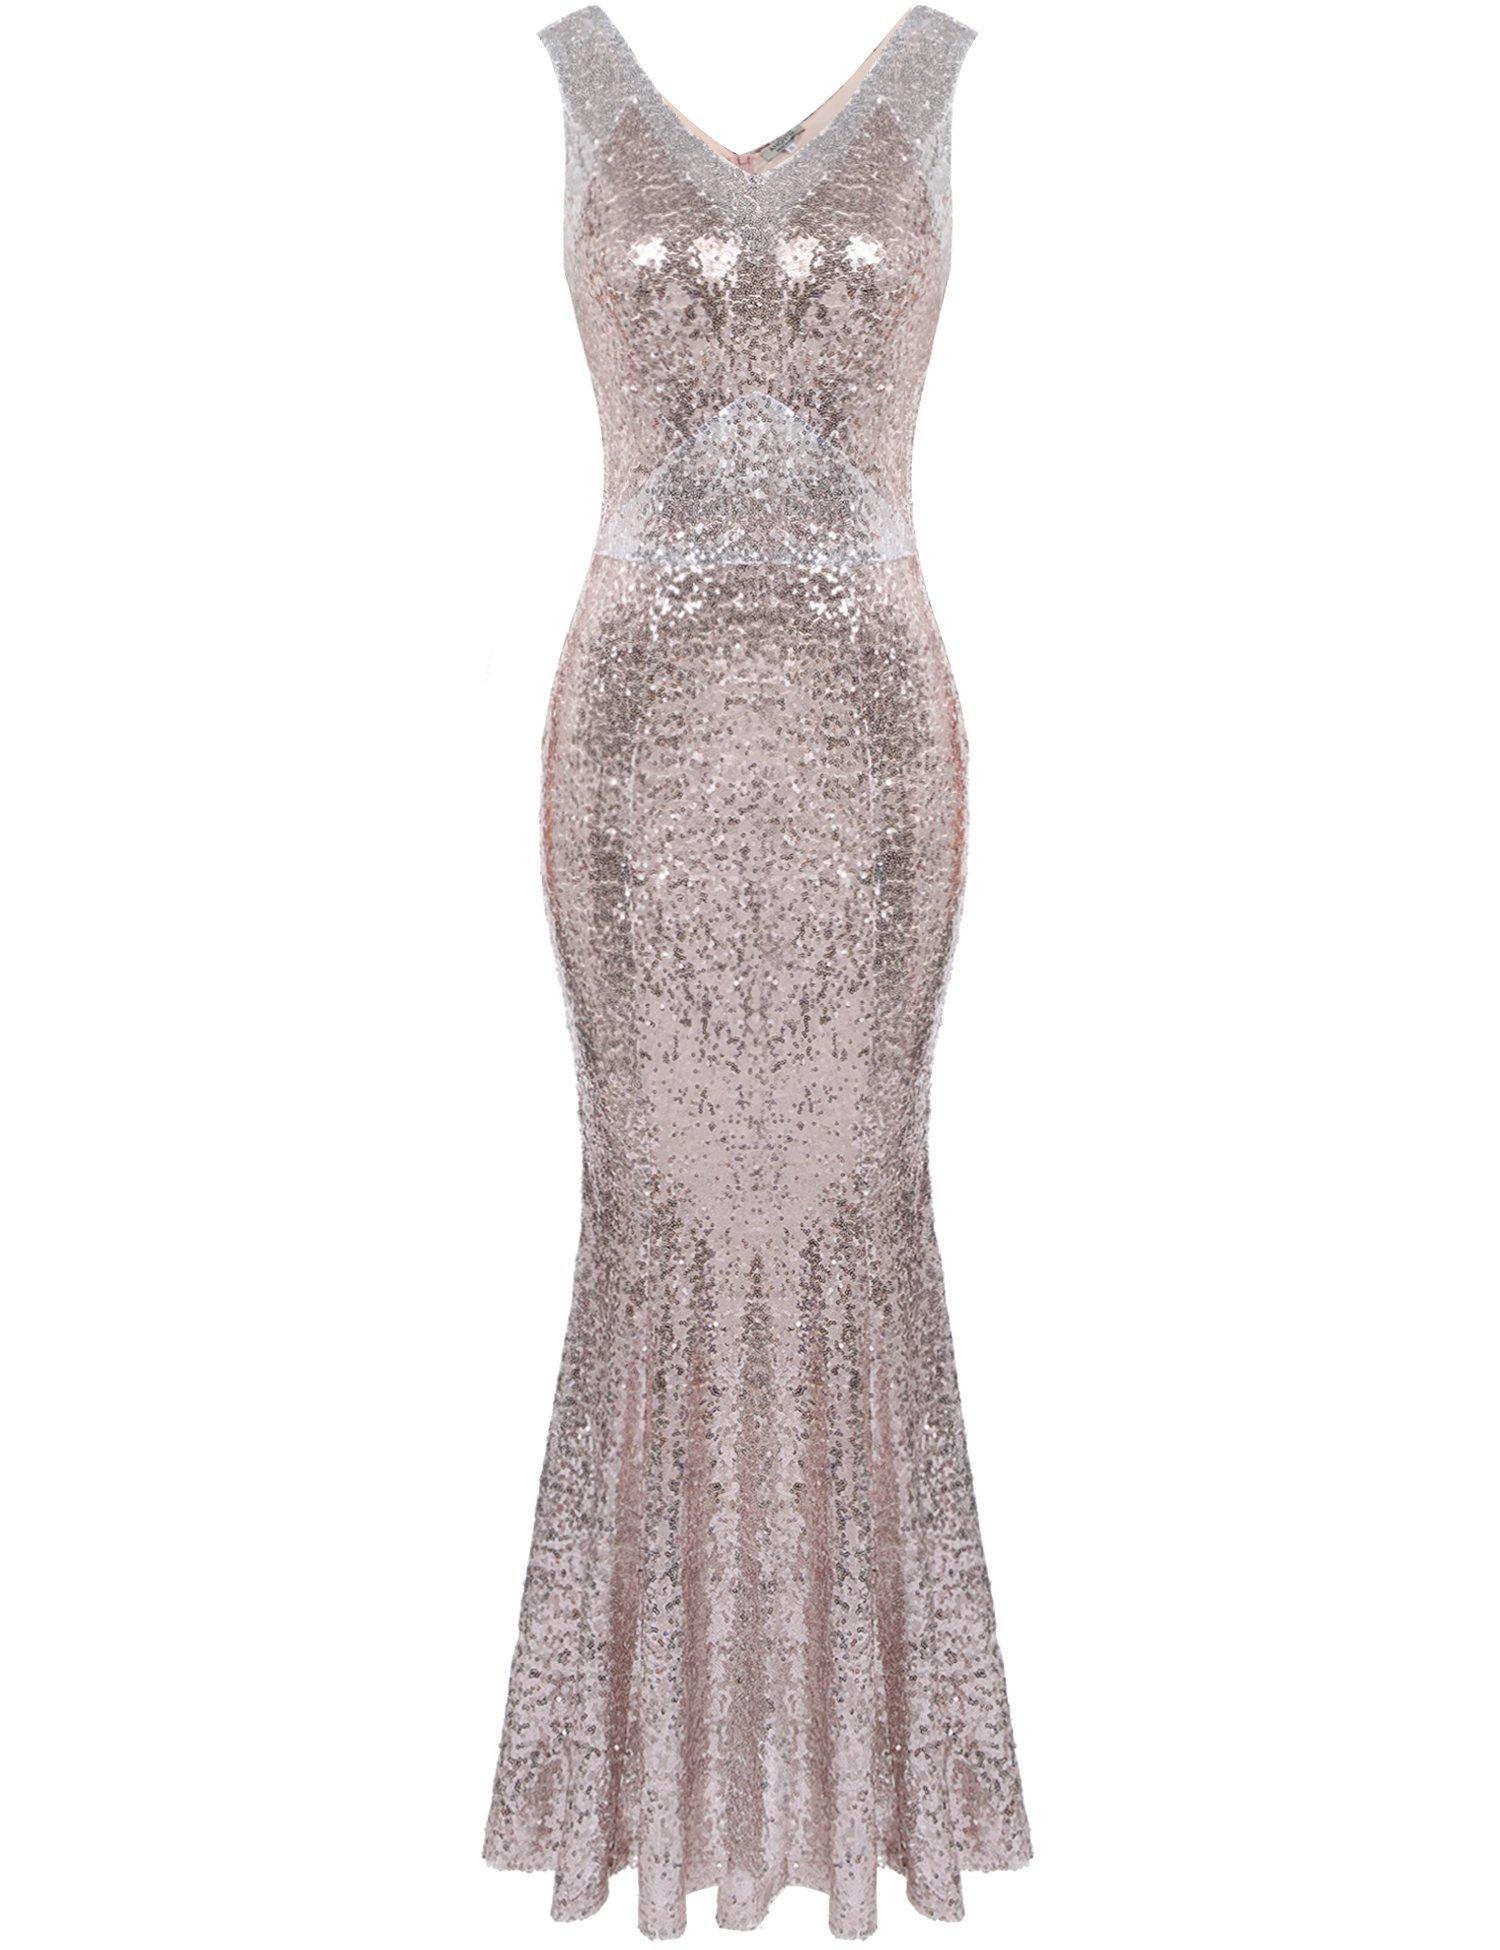 ANGVNS Sexy Sleeveless V Neck Sequins Sparkle Mermaid Bodycon Maxi Prom Dress